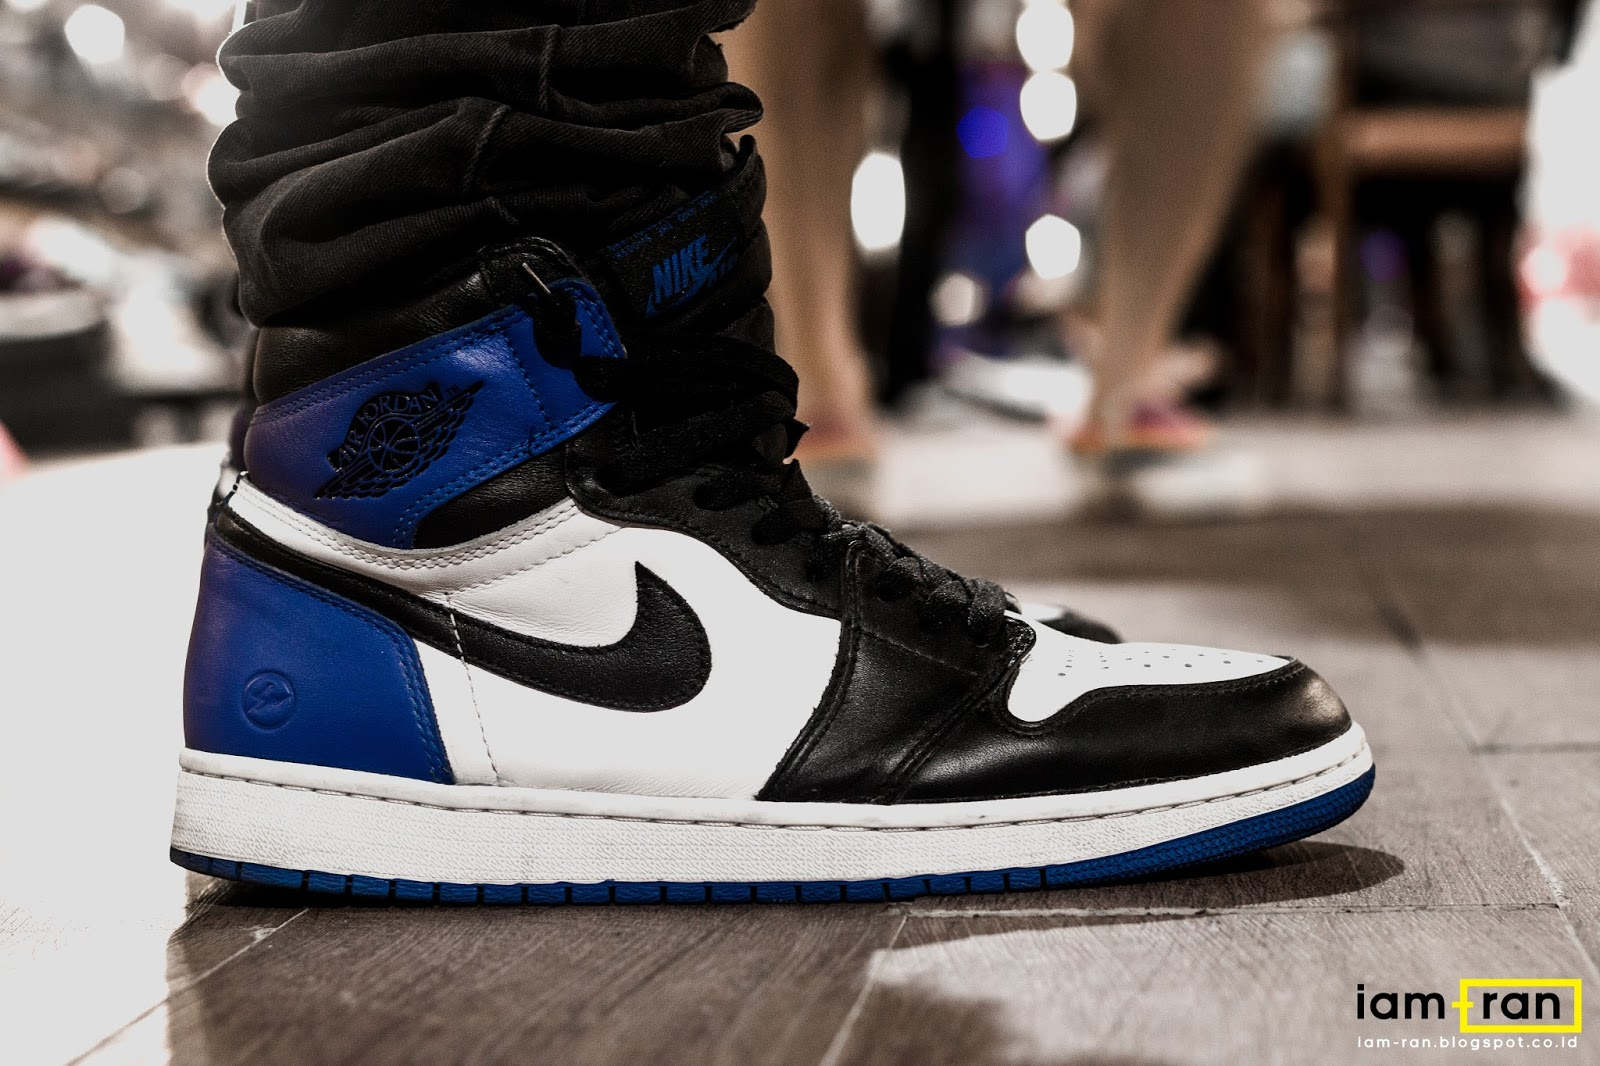 6e5c25cba22 IAM-RAN: ON FEET : In.Dhika - Nike Air Jordan 1 X Fragment